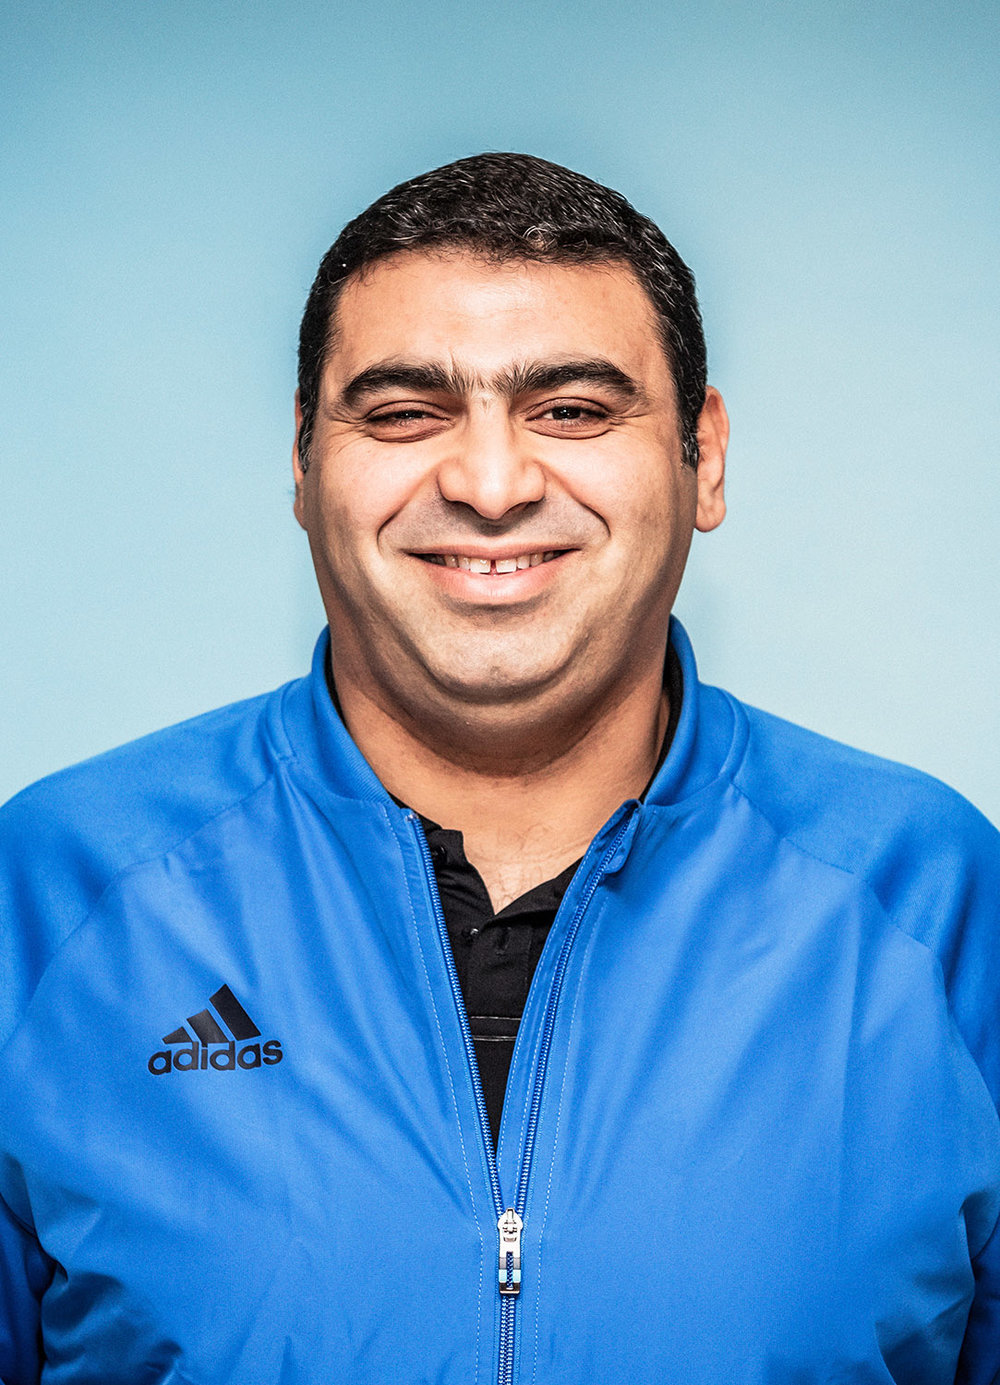 Mahmoud Mohammed B-Trainerlizenz 0176 611 679 75